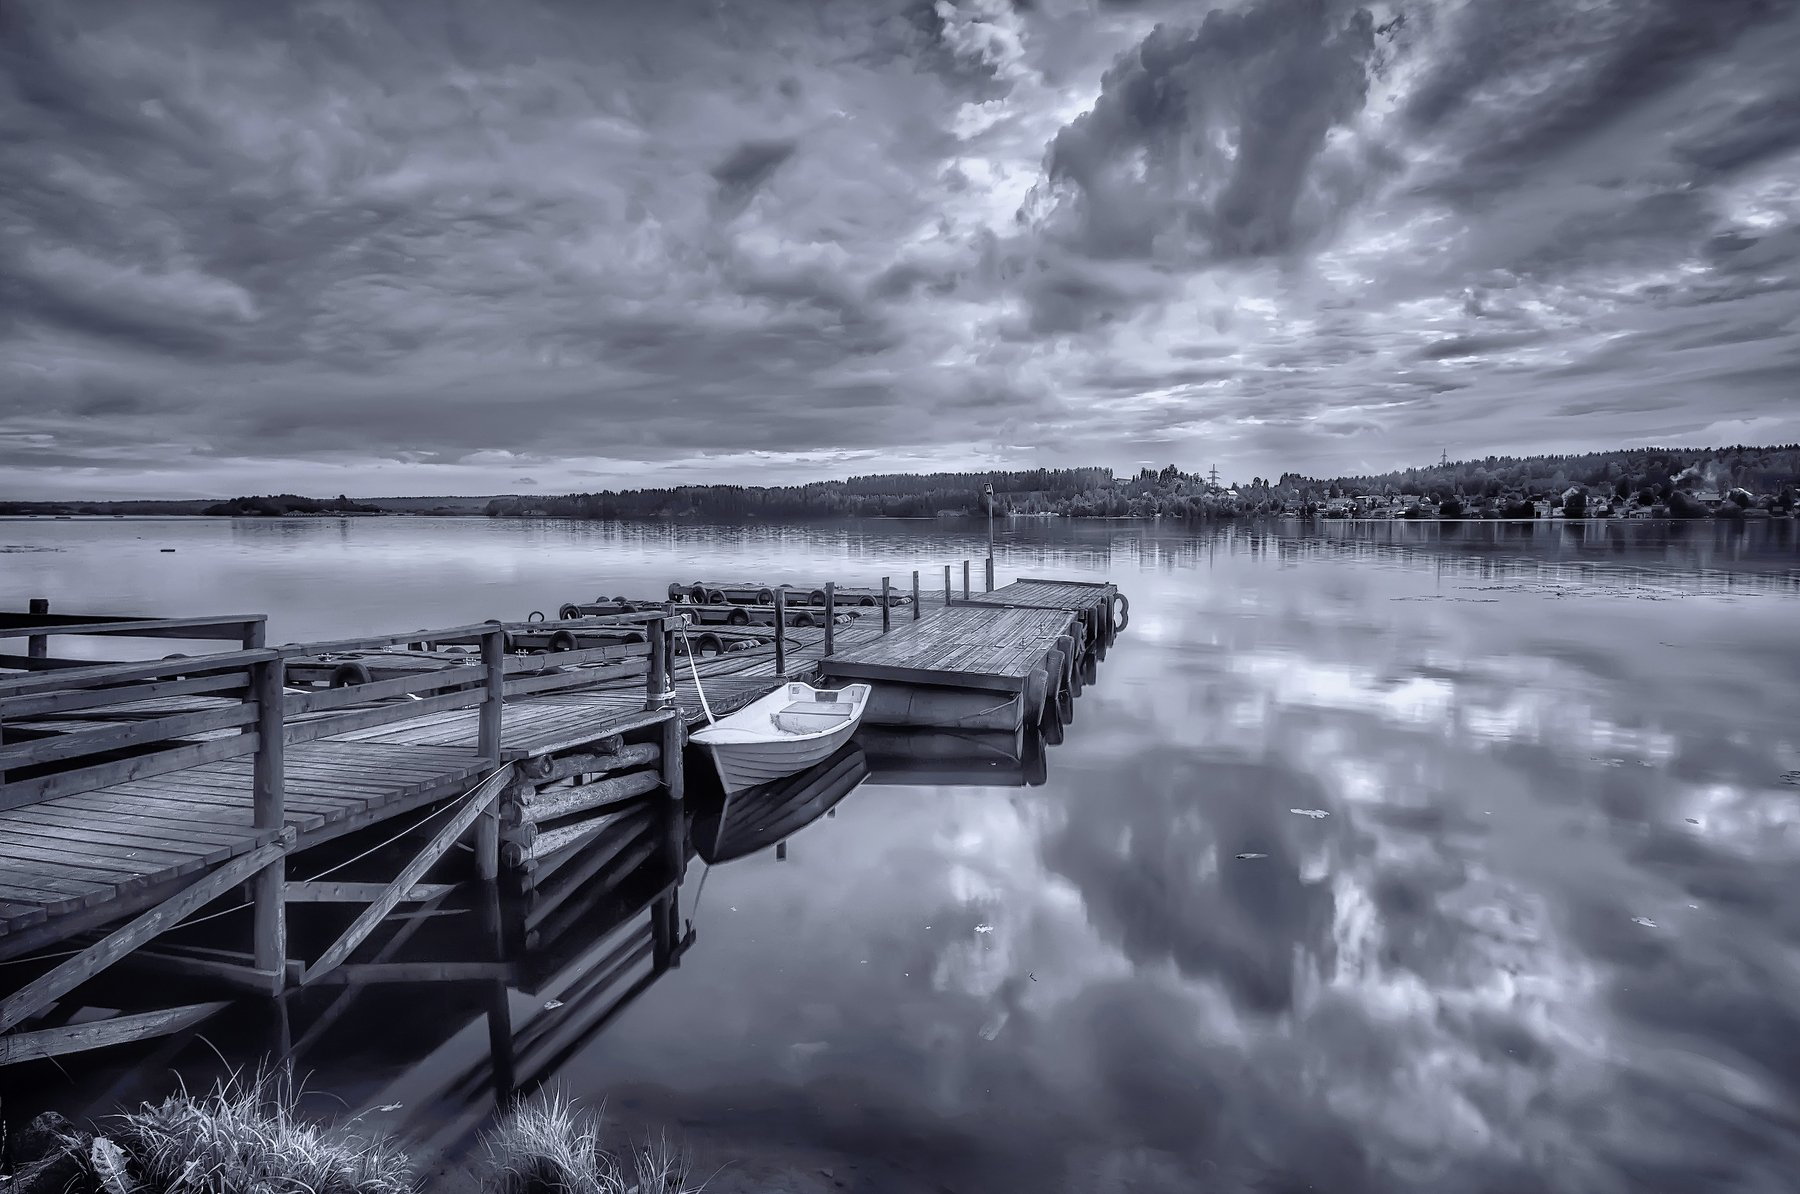 пейзаж,озеро,карелия,лодка,пирс,причал,берег,деревня, Тамара